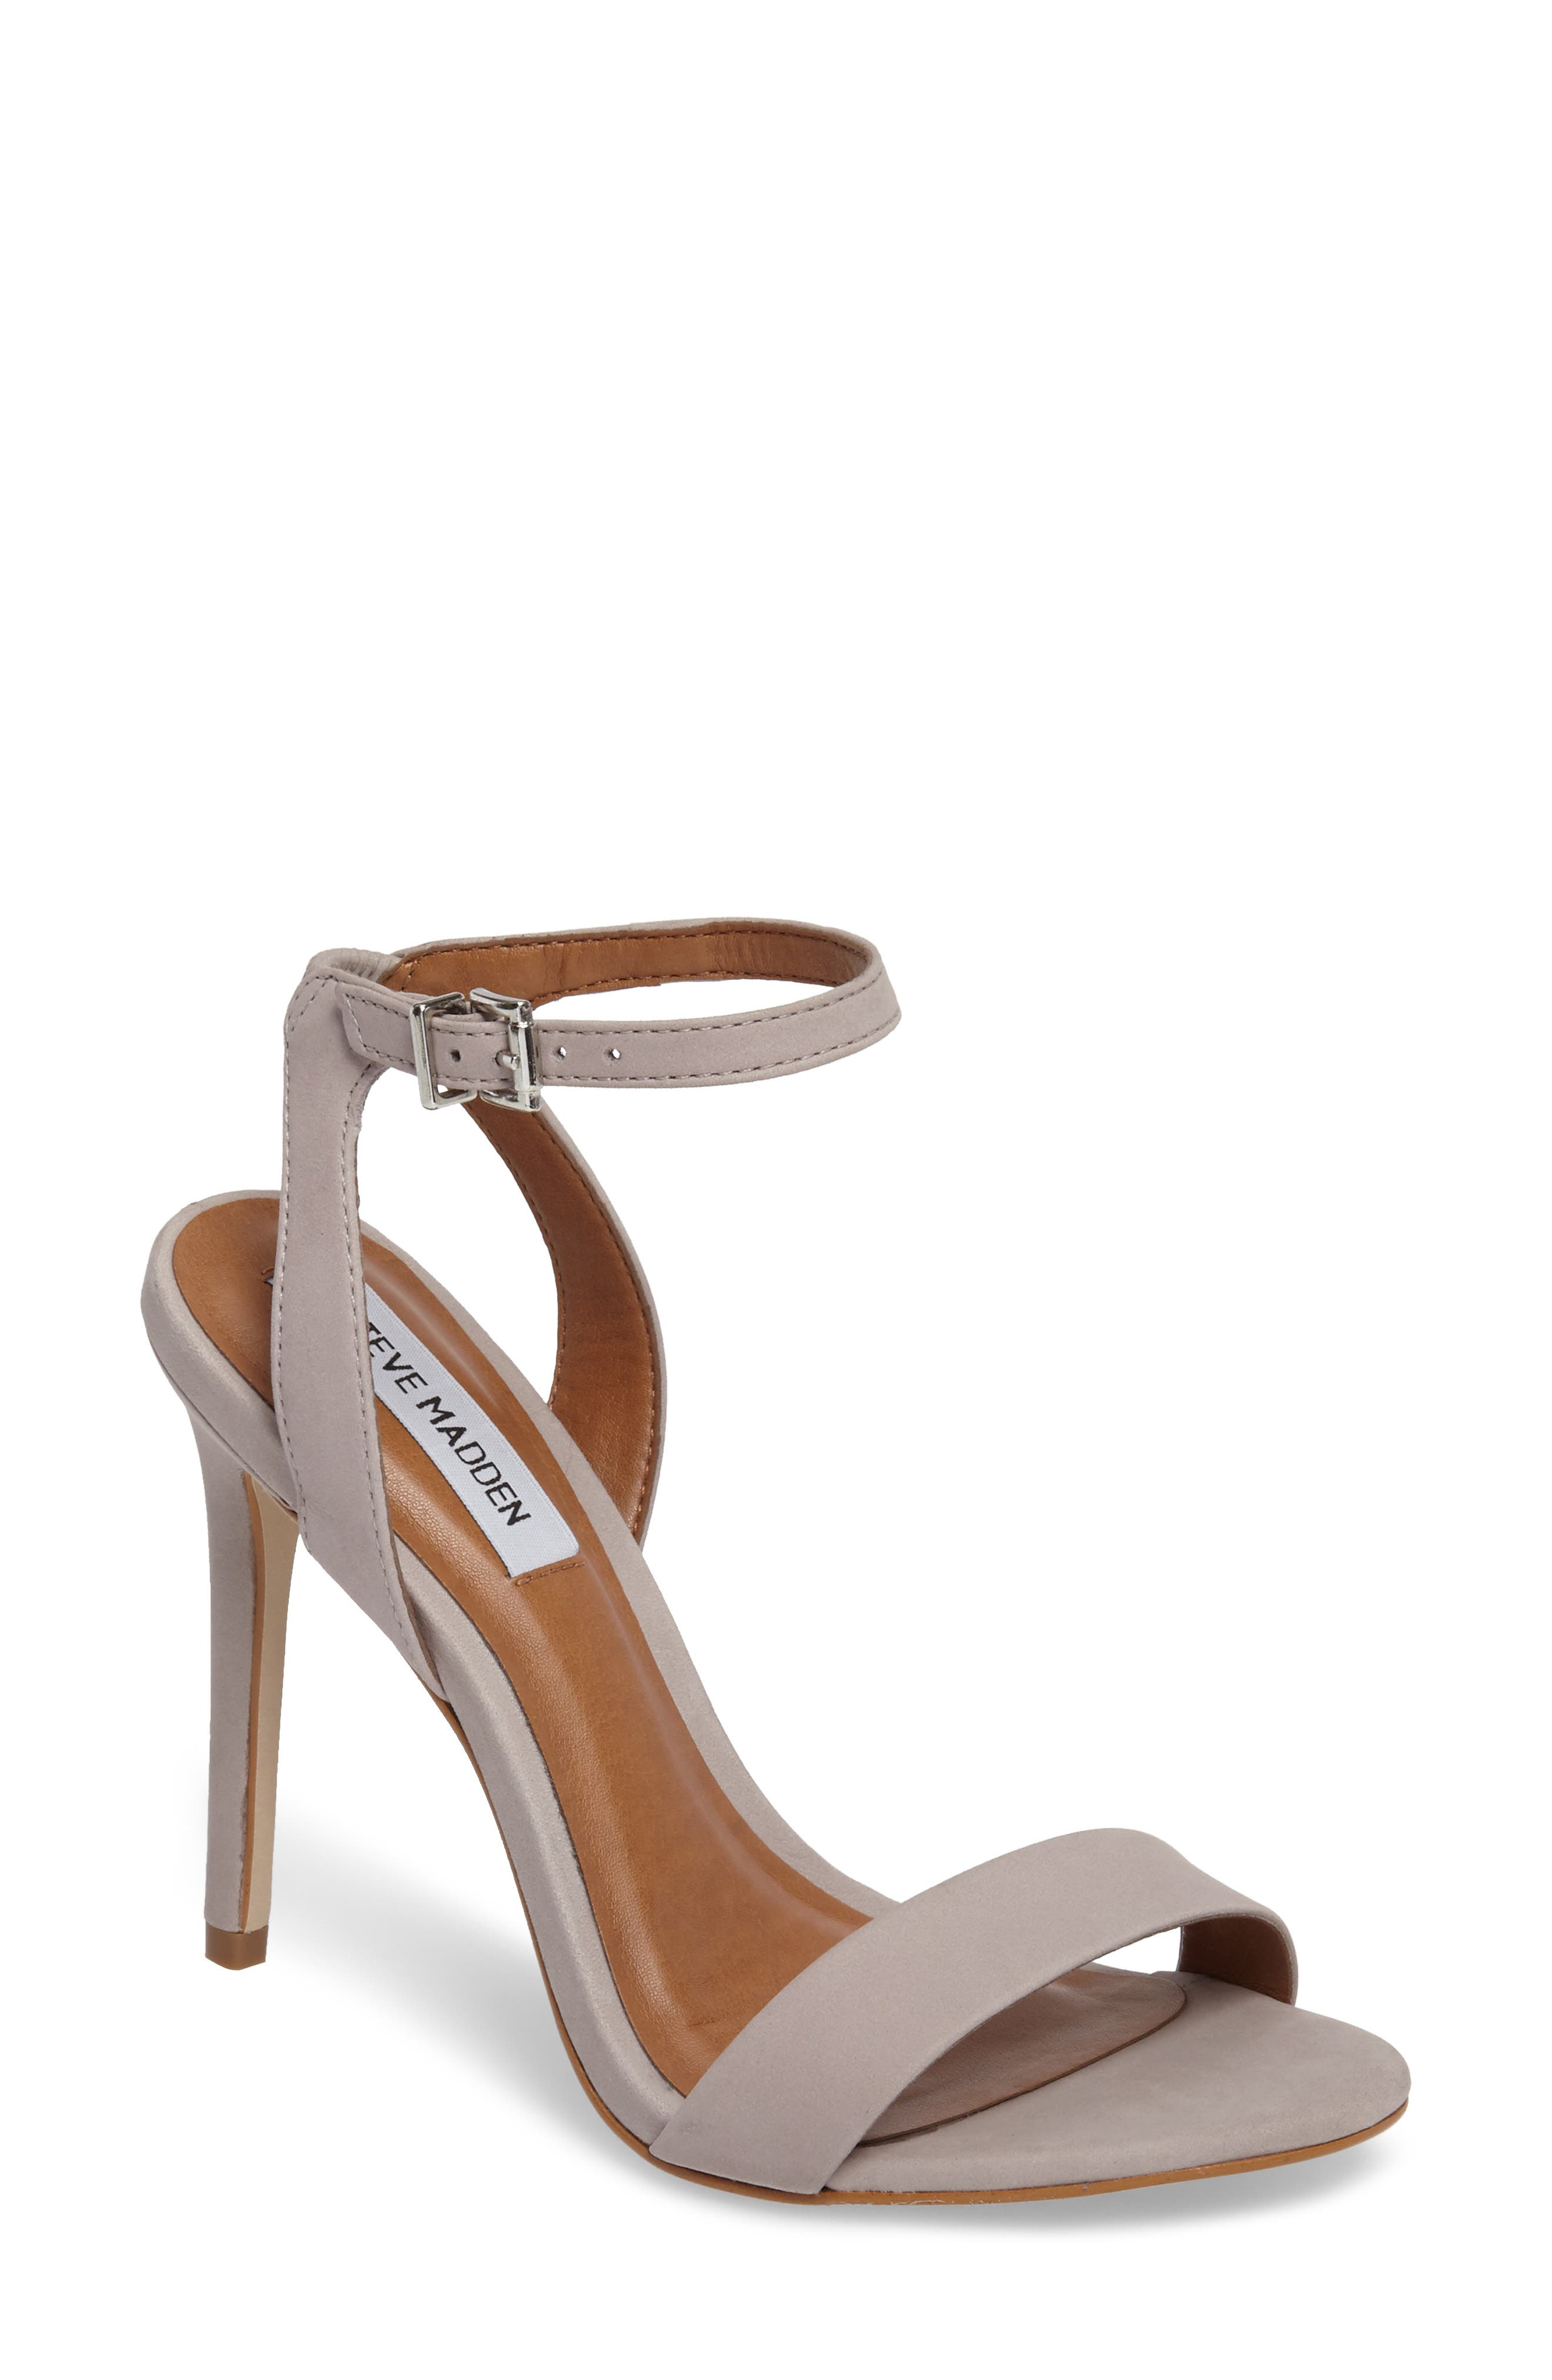 Grey High Heels CmcMeNpQ